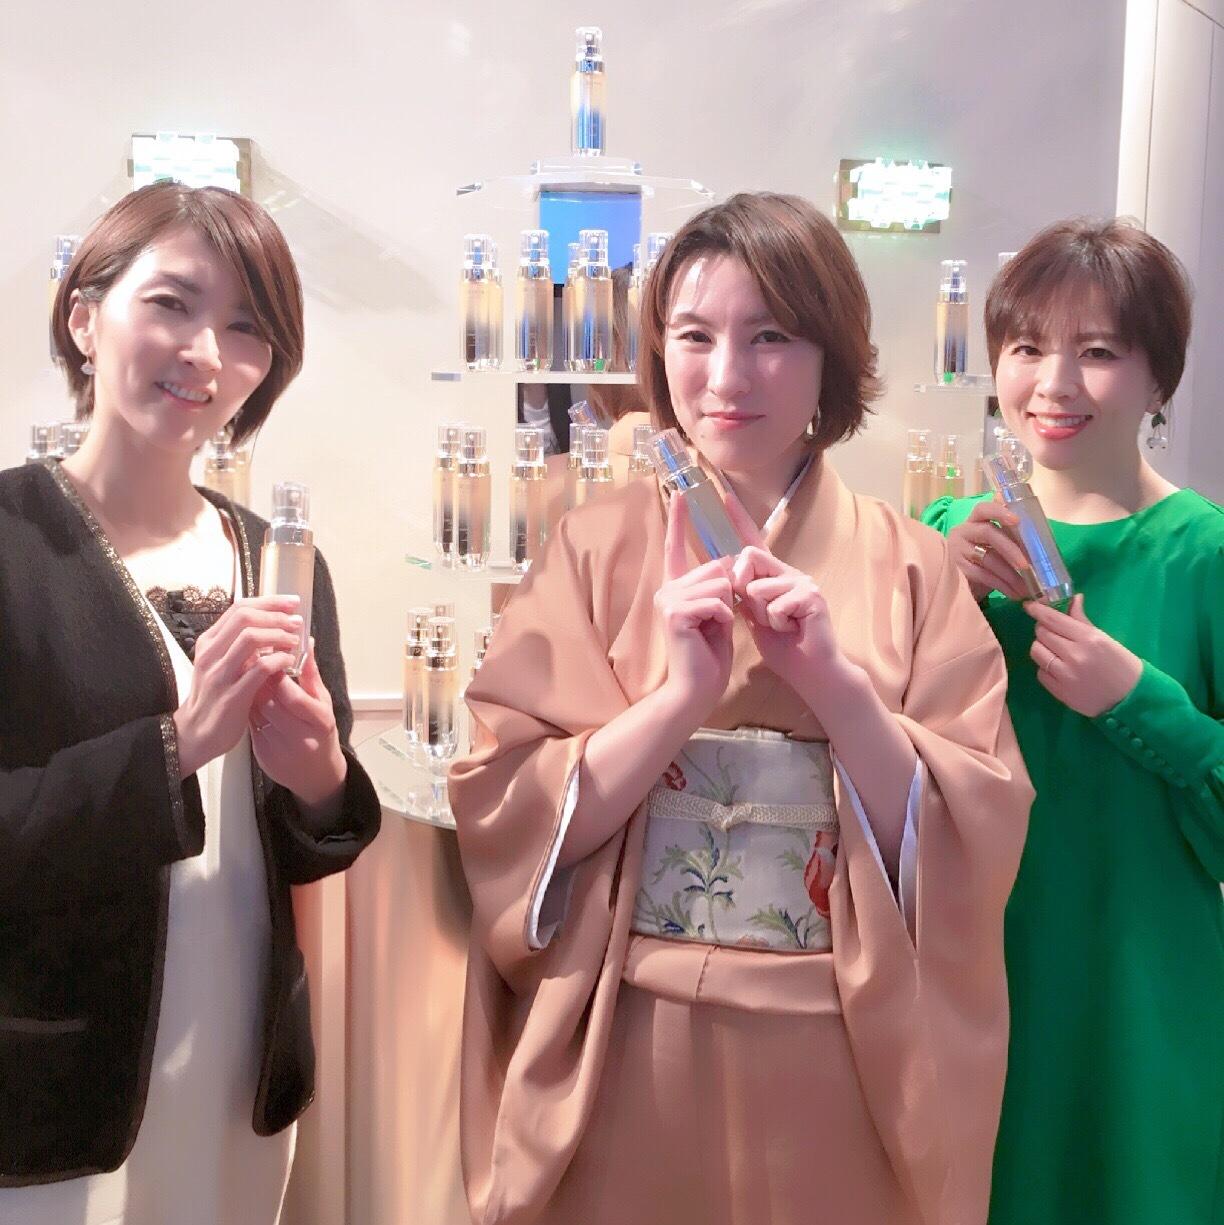 Special thanks Marisol♥「資生堂 クレ・ド・ポー ボーテ」新製品体験イベントへ_1_3-2